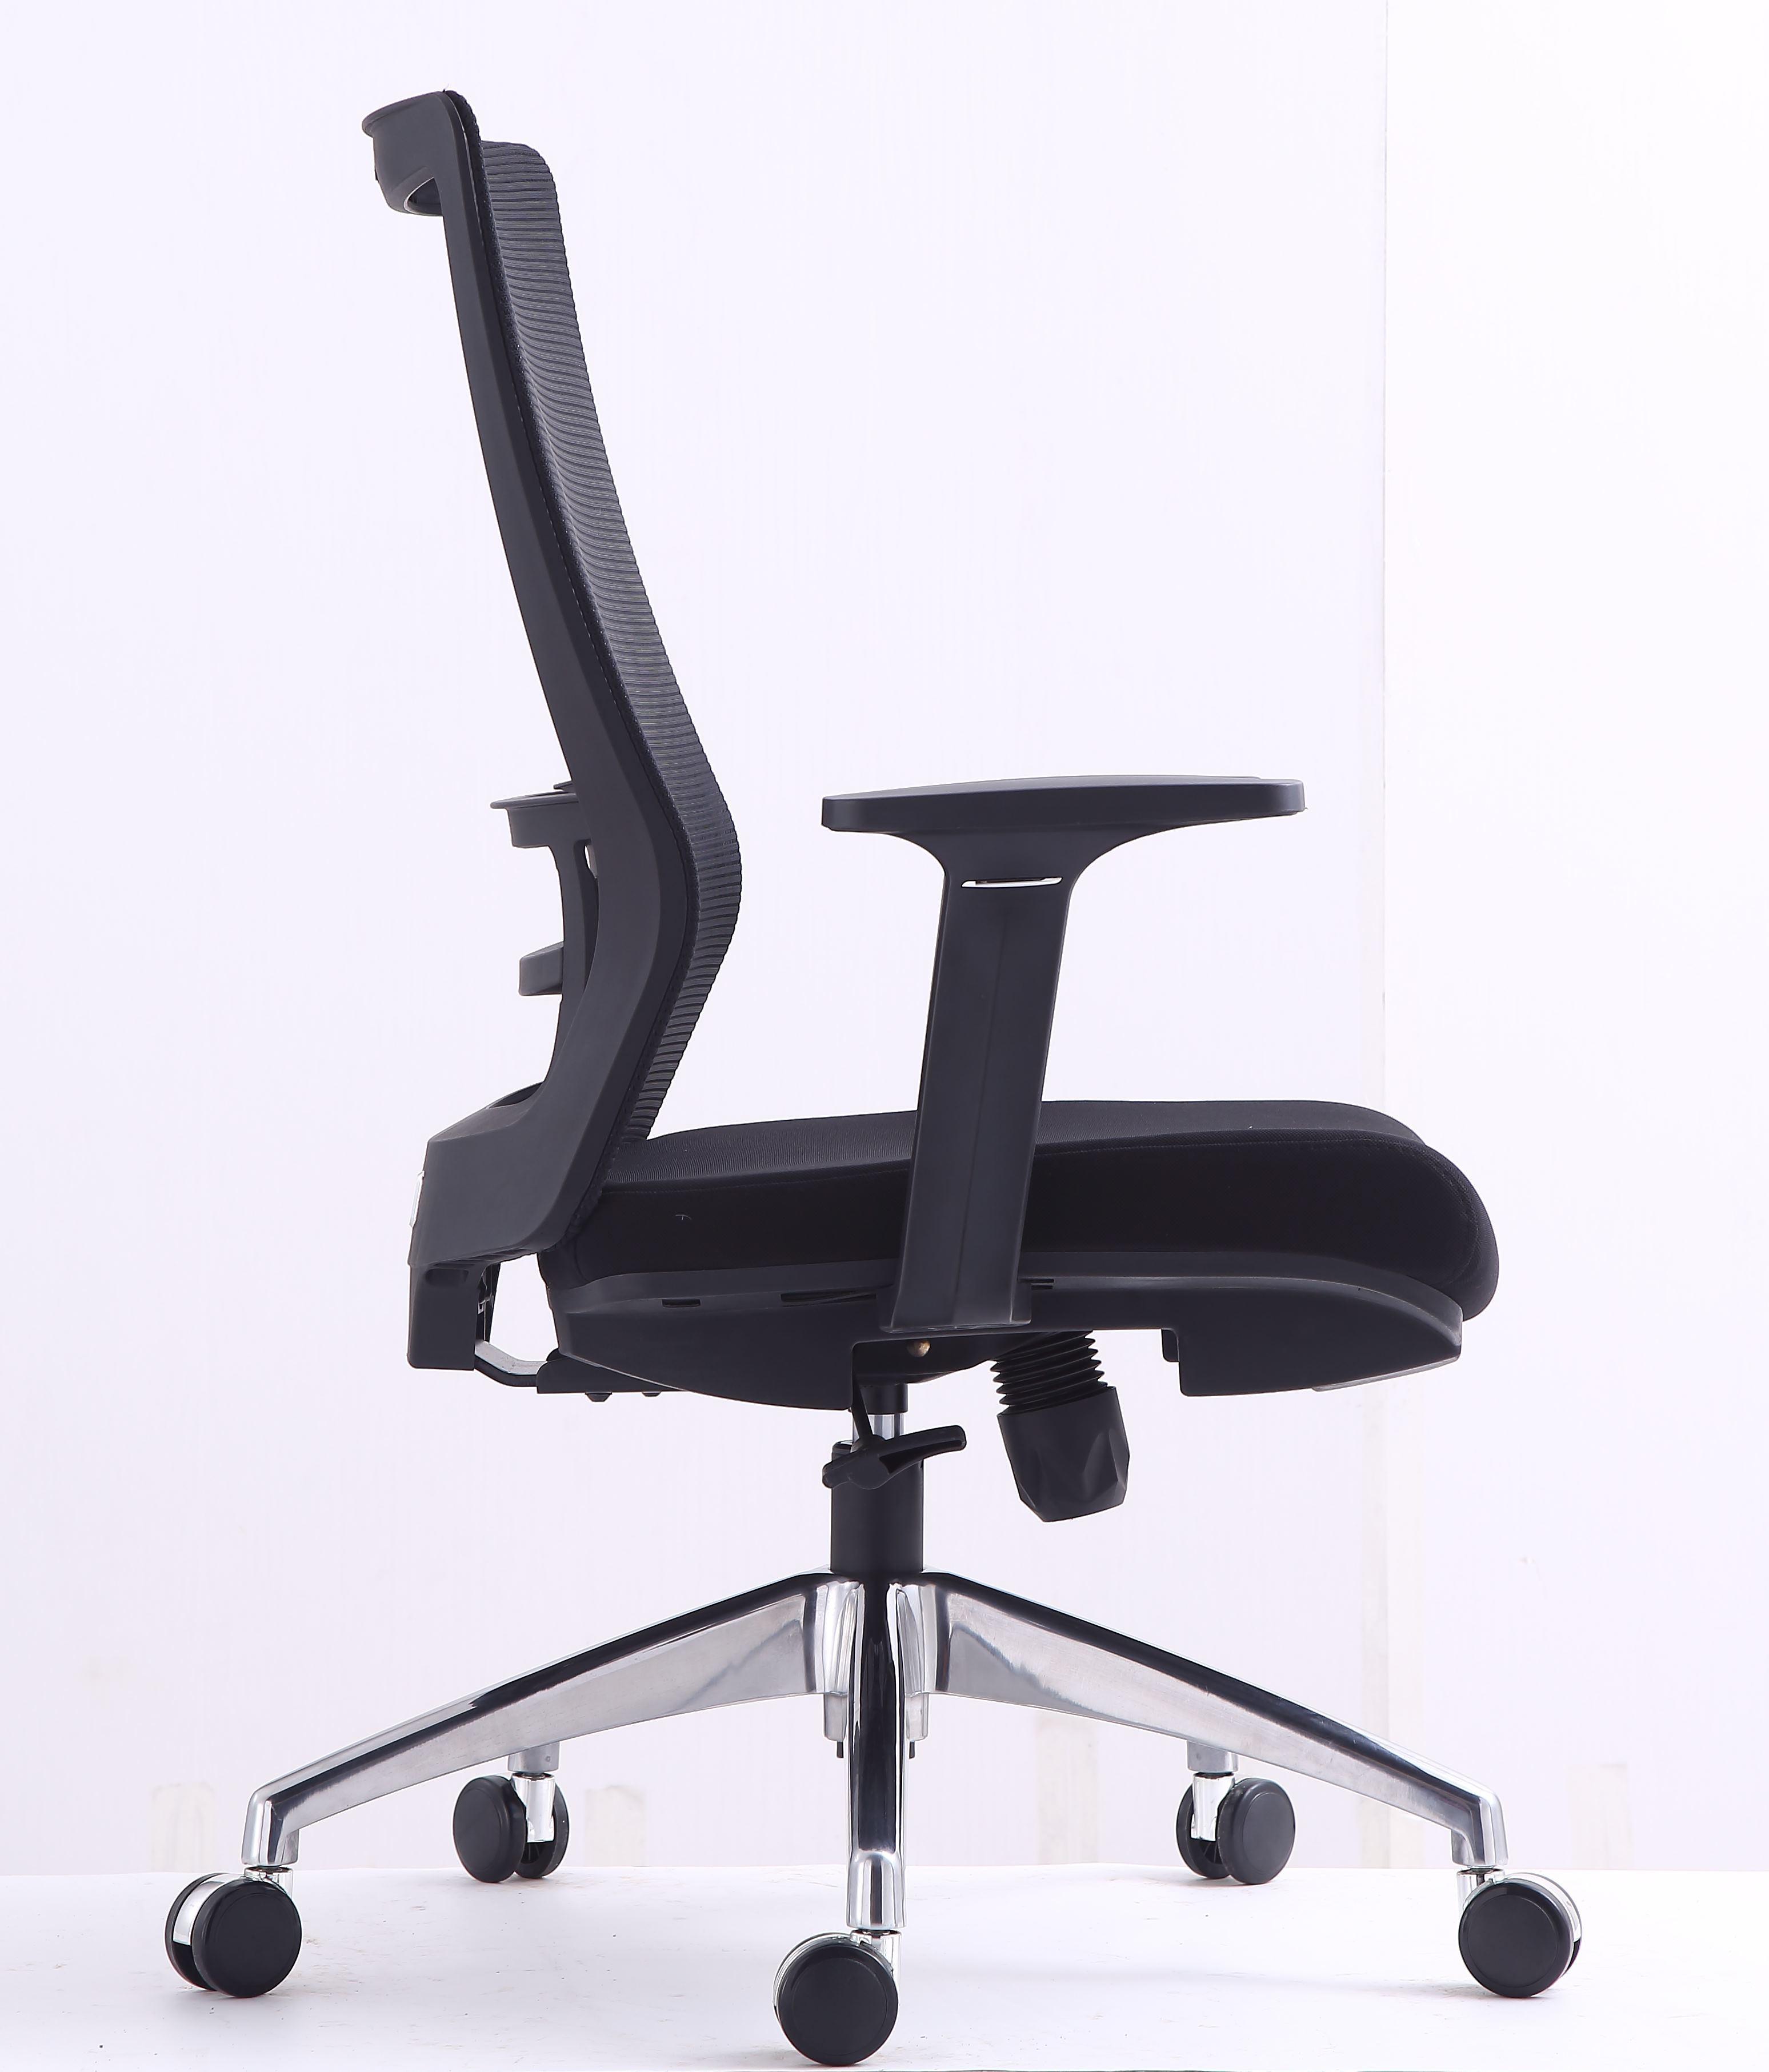 Hot Item Ergonomic Office Furniture Lumbar Support Mesh Office Chair Lsm M1806